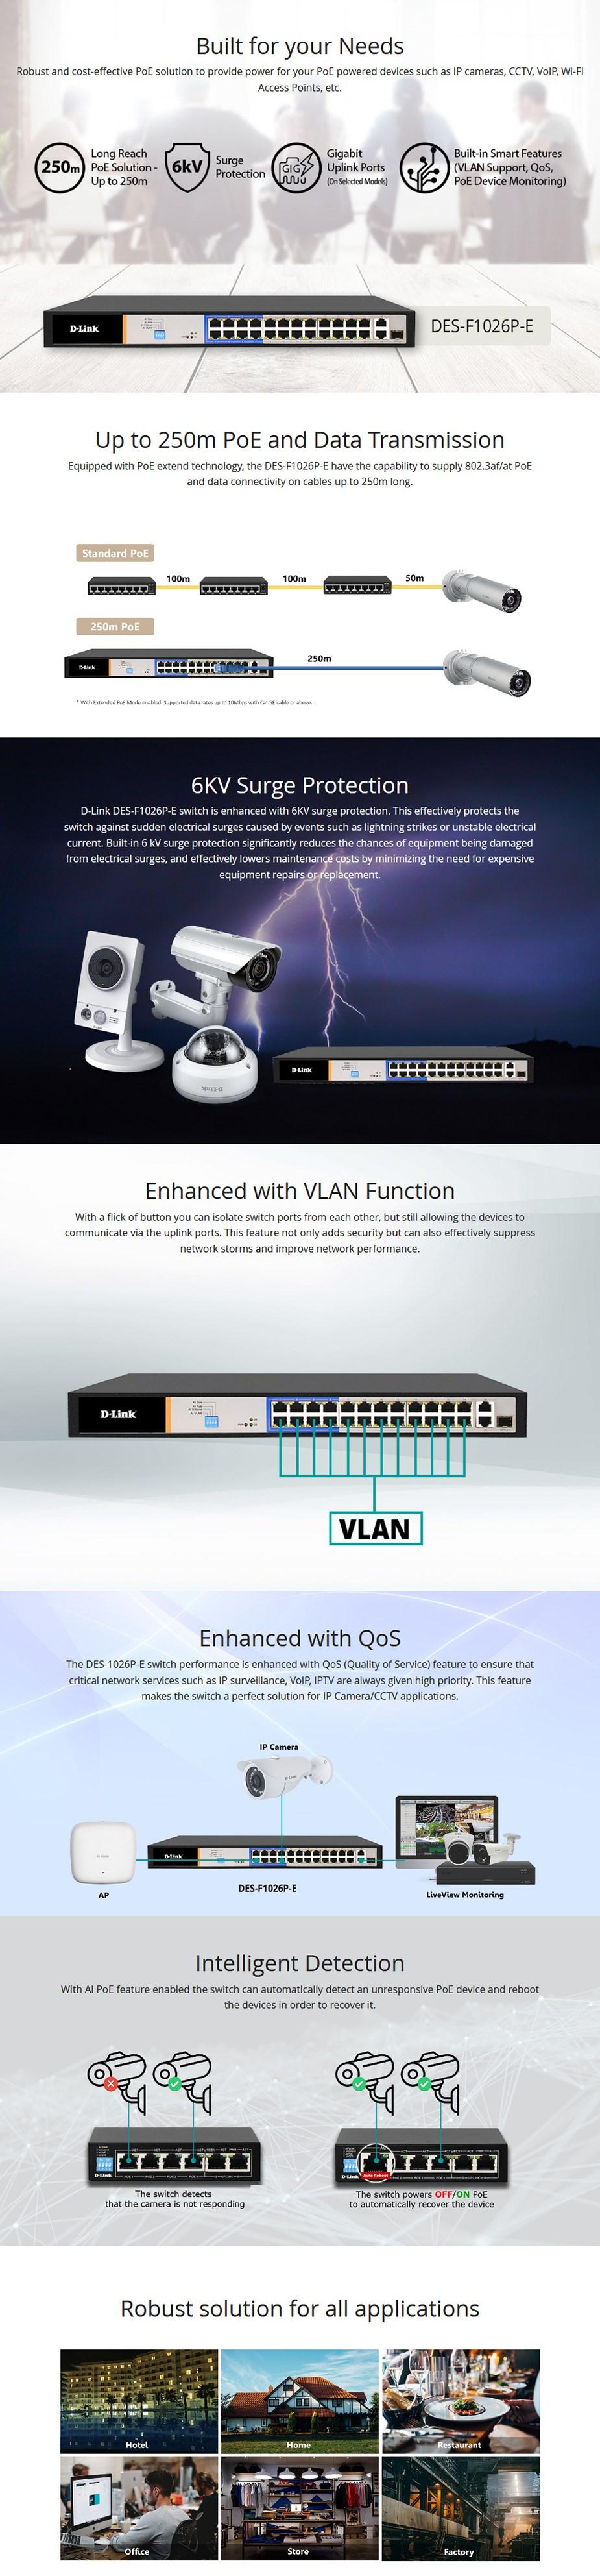 D-Link DES-F1026P-E 26-Port PoE Switch with 24 PoE Ports/2 Gigabit Uplink Ports - Overview 1